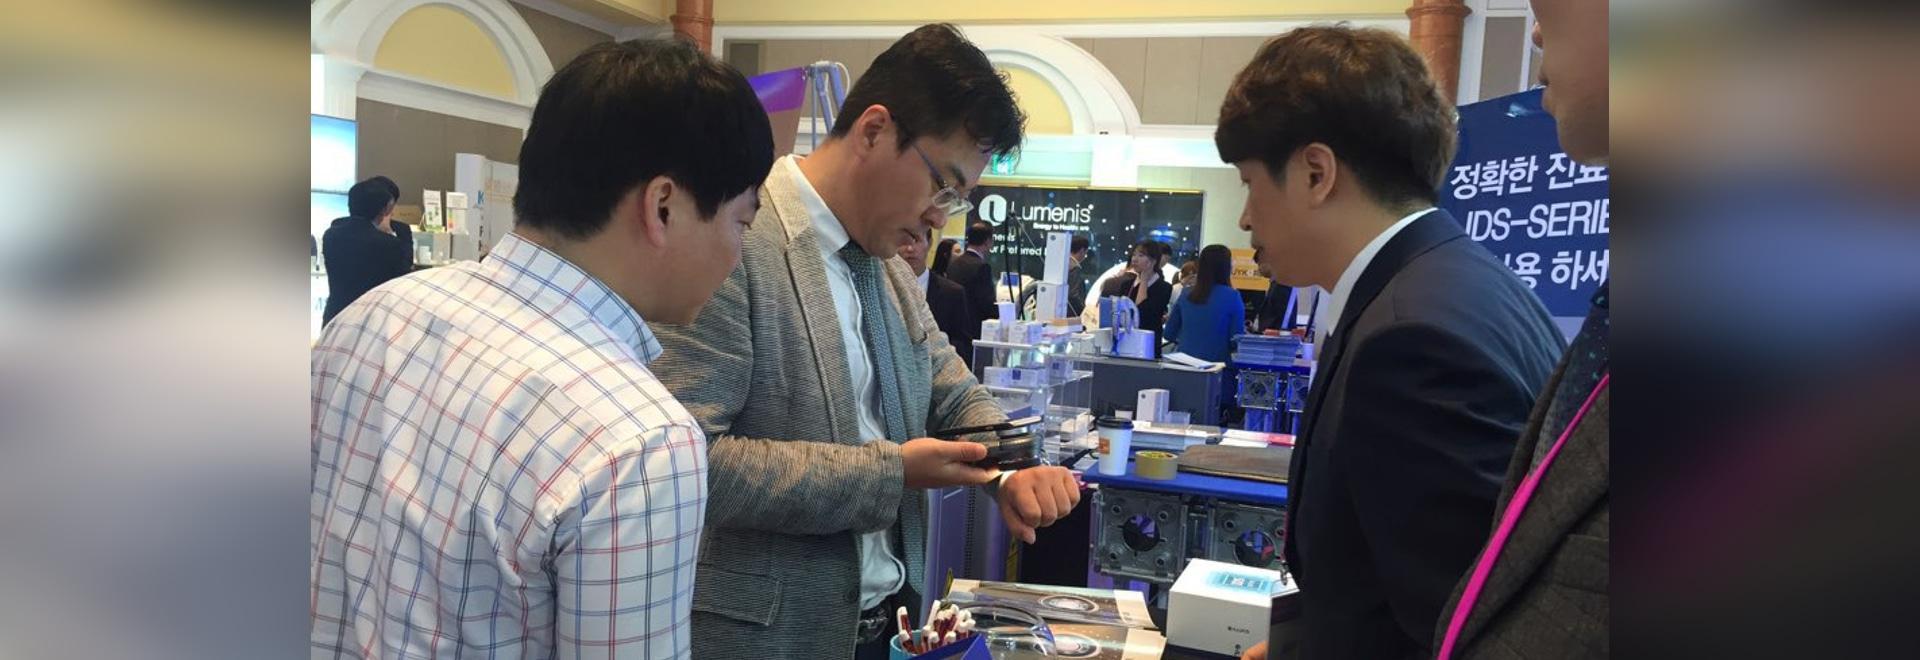 ILLUCO Dermatoscope IDS-Series on Show (Busan 2016)